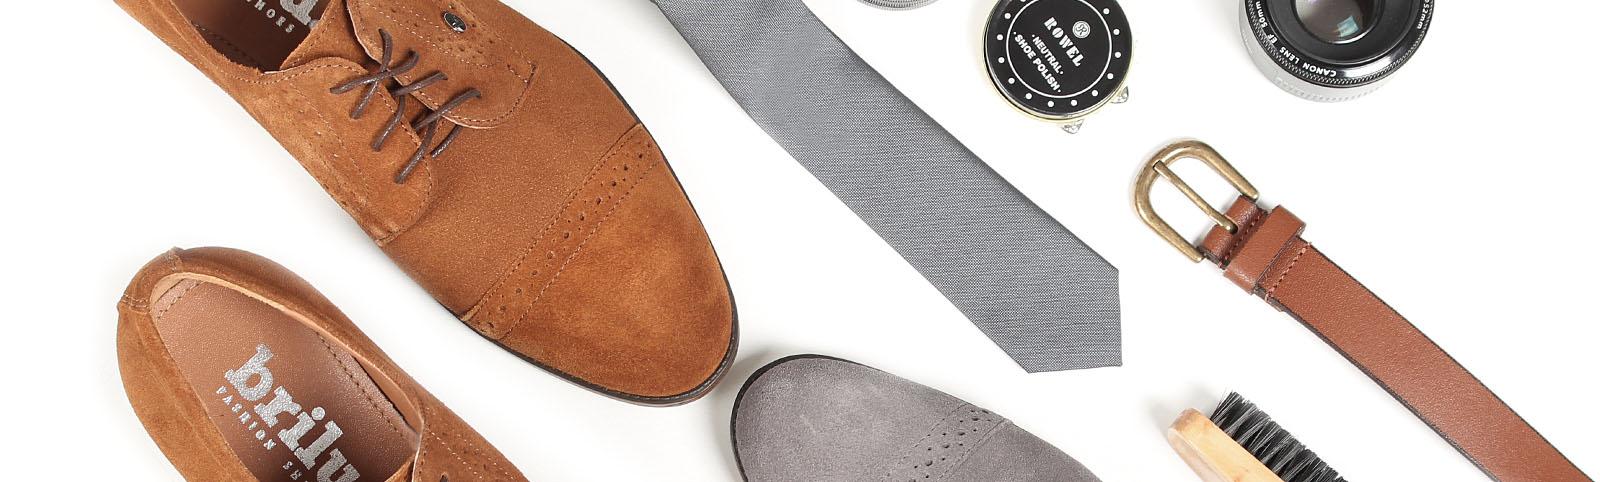 Jak dbać o skórzane buty? | Blog Brilu.pl